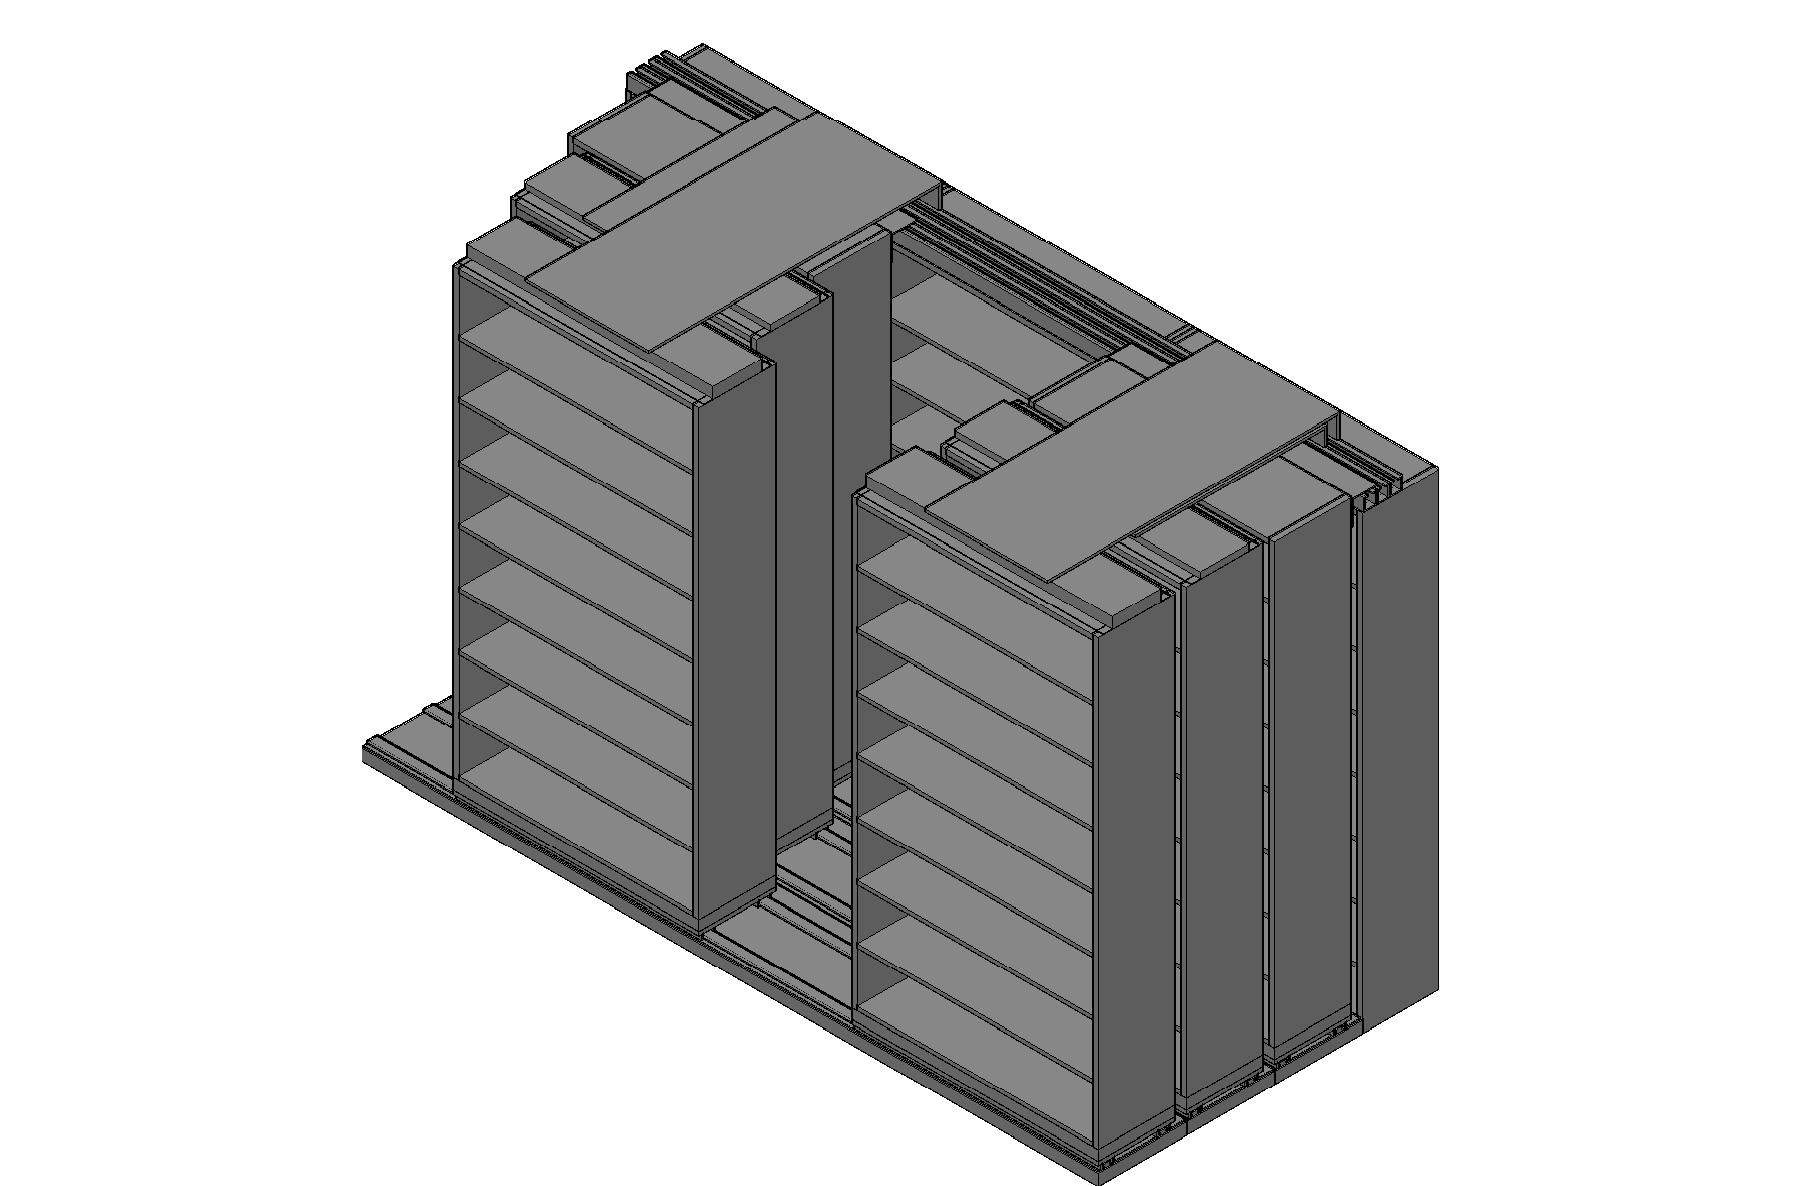 "Legal Size Sliding Shelves - 4 Rows Deep - 8 Levels - (48"" x 15"" Shelves) - 148"" Total Width"